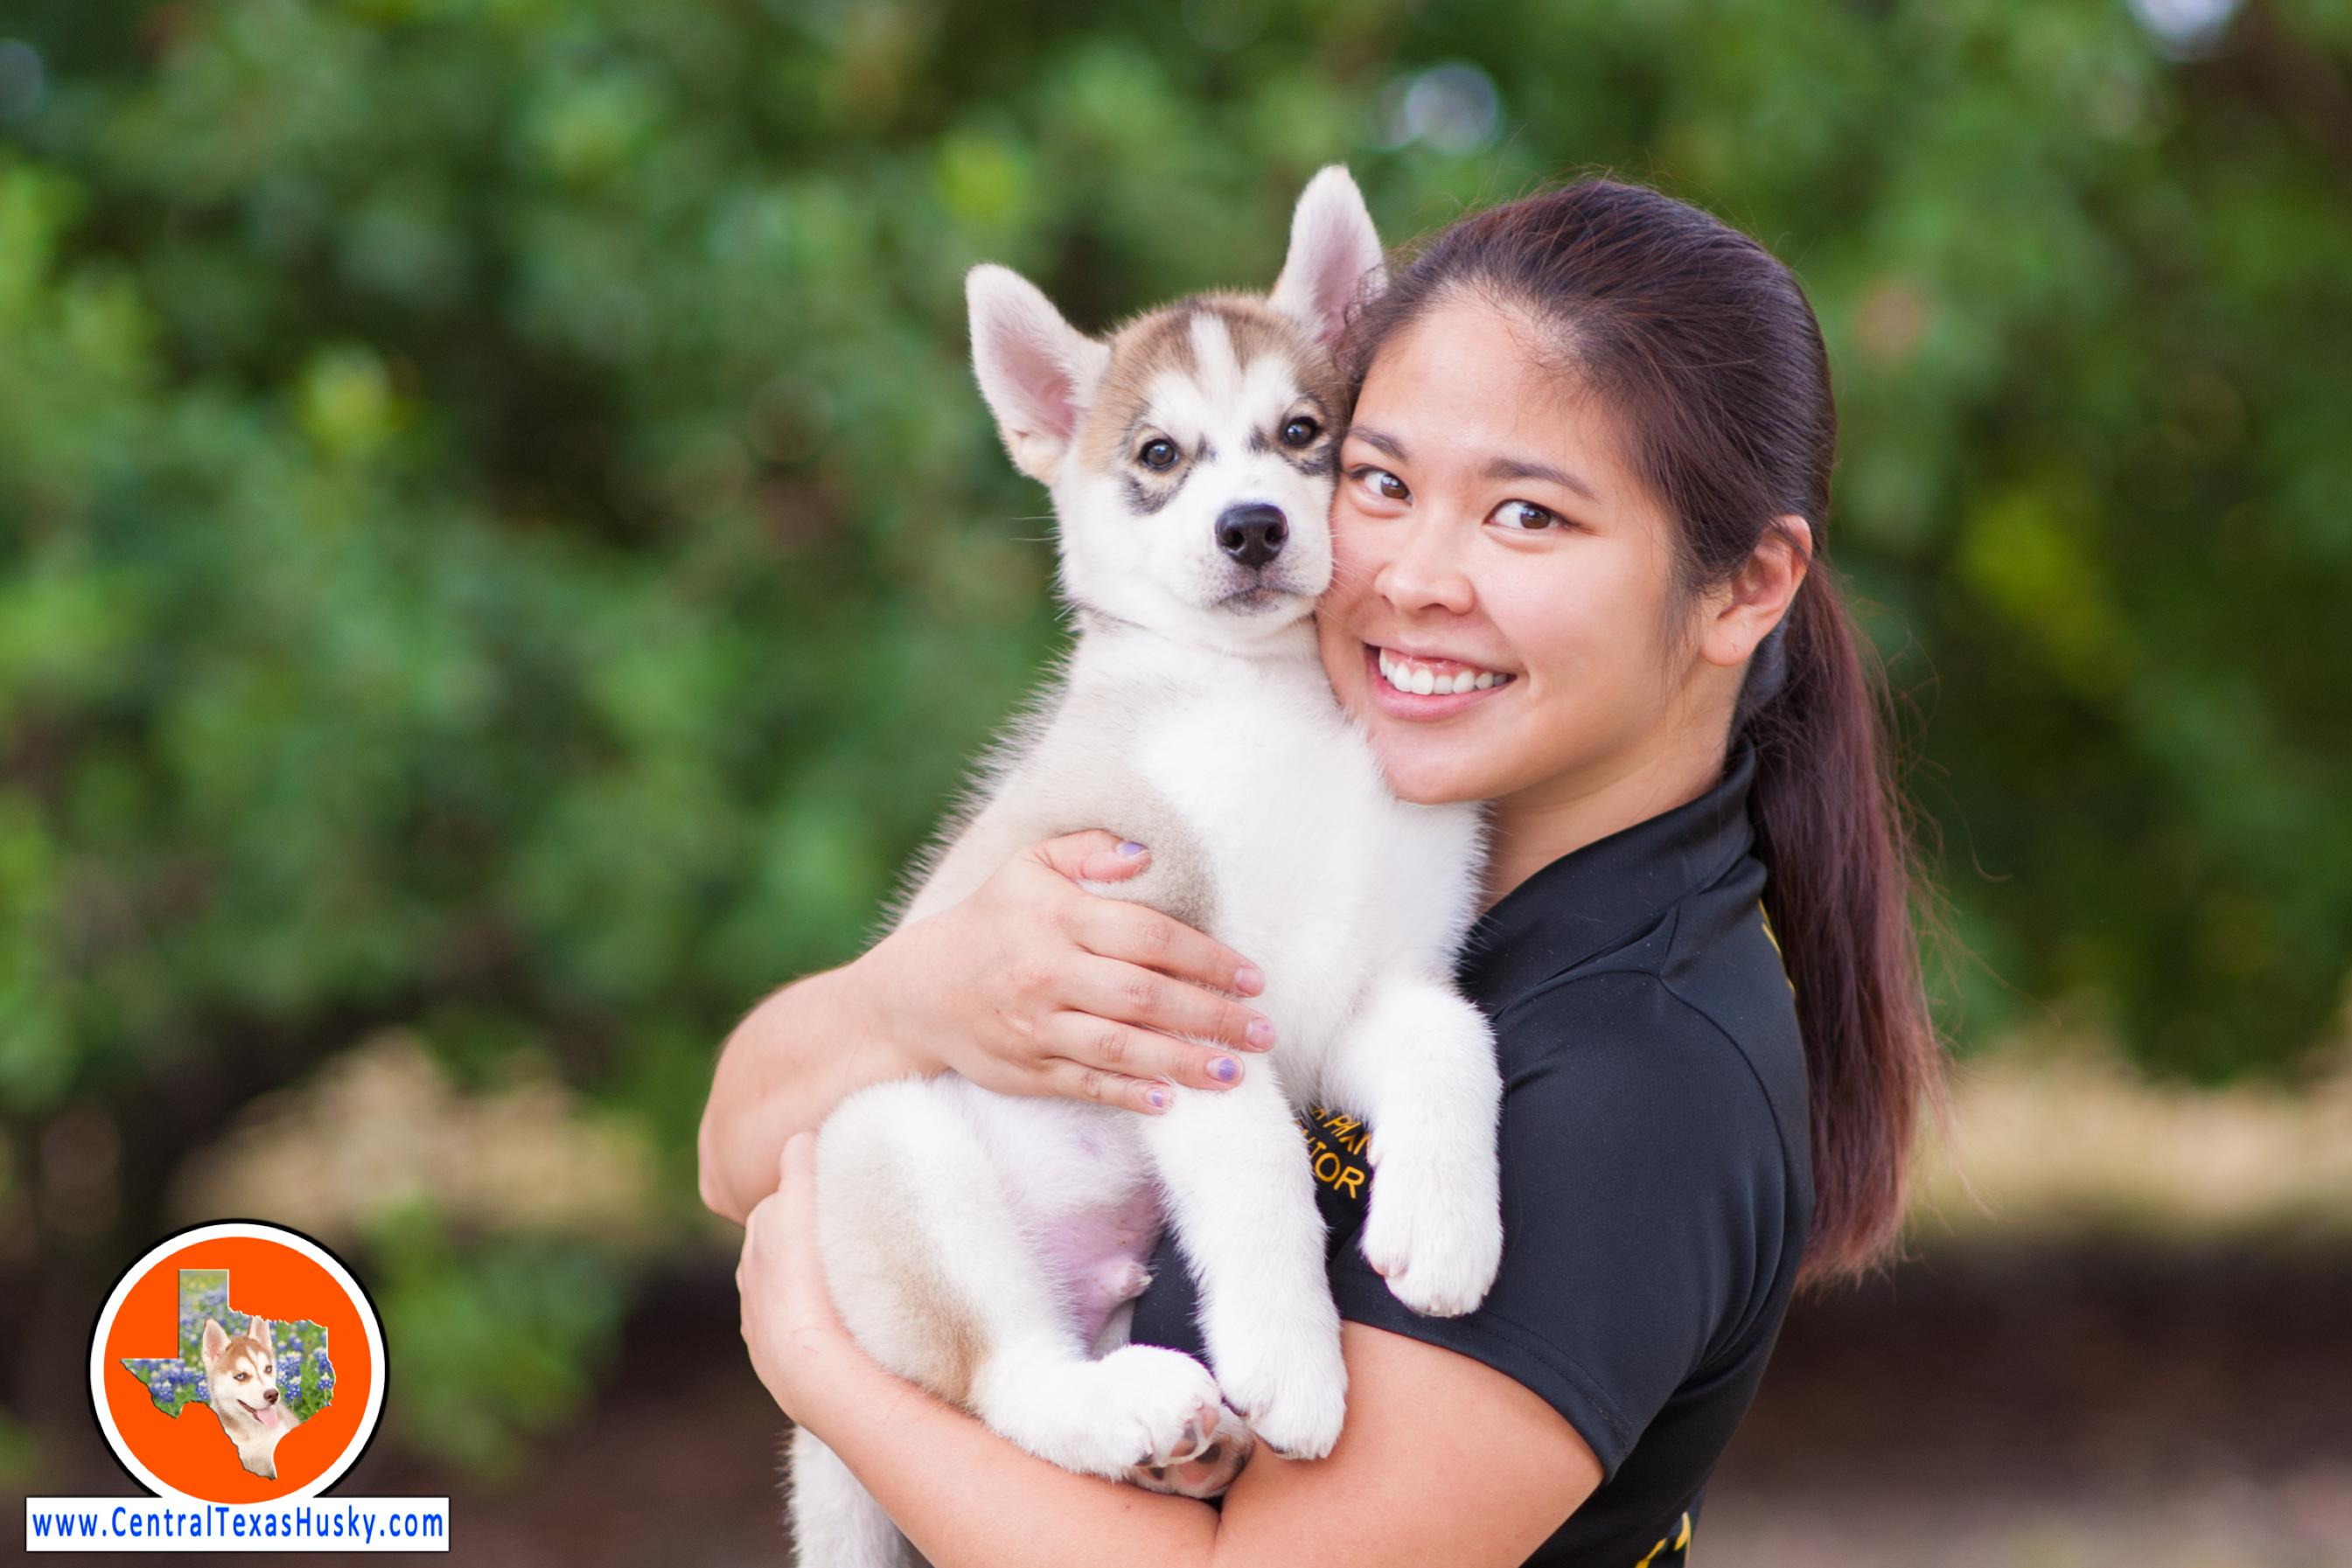 central-texas-husky_austin-siberian-husky-breeder_702583_20171104